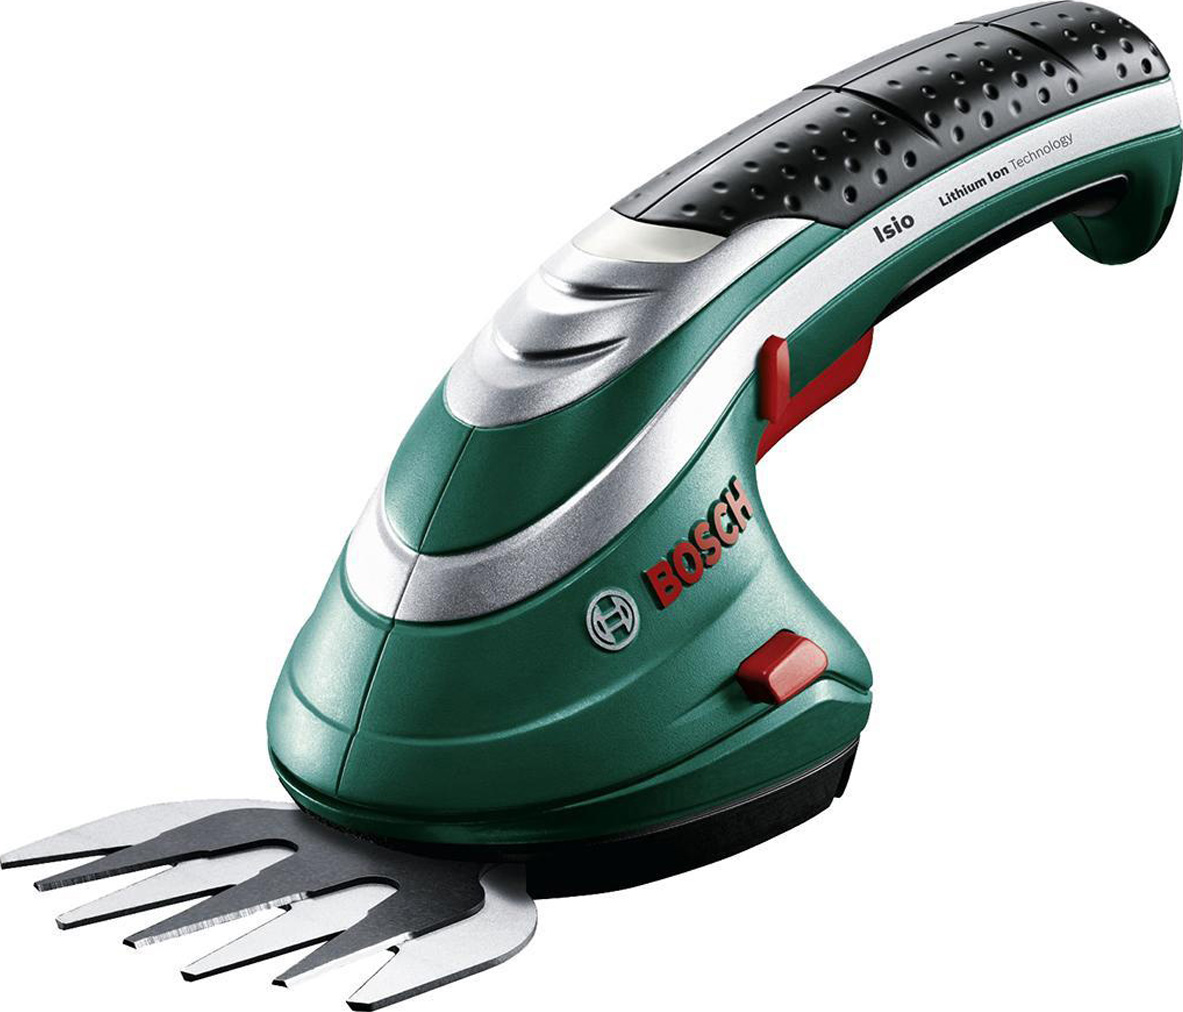 Аккумуляторные ножницы для травы Bosch ISIO 3 + чехол 0600833100 аккумуляторные ножницы bosch isio 3 для травы и кустов перчатки laura ashley 060083310m